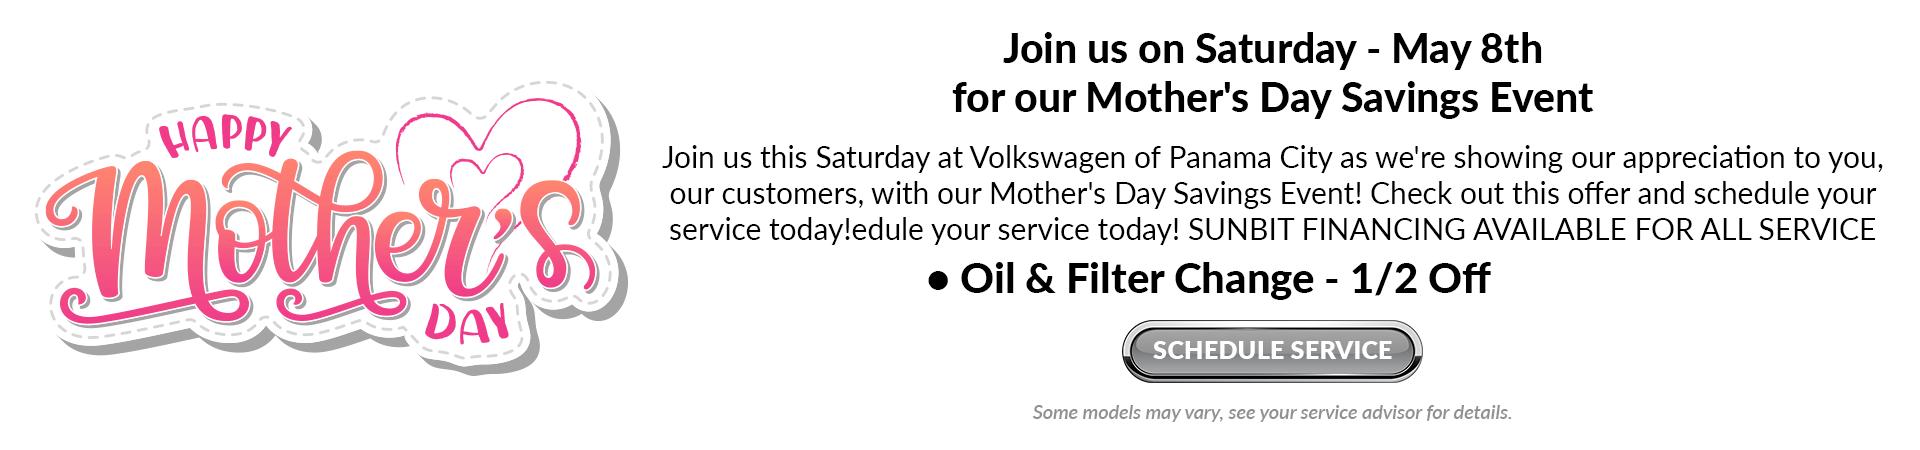 08-MAY-web-Volkswagen-of-Panama-City